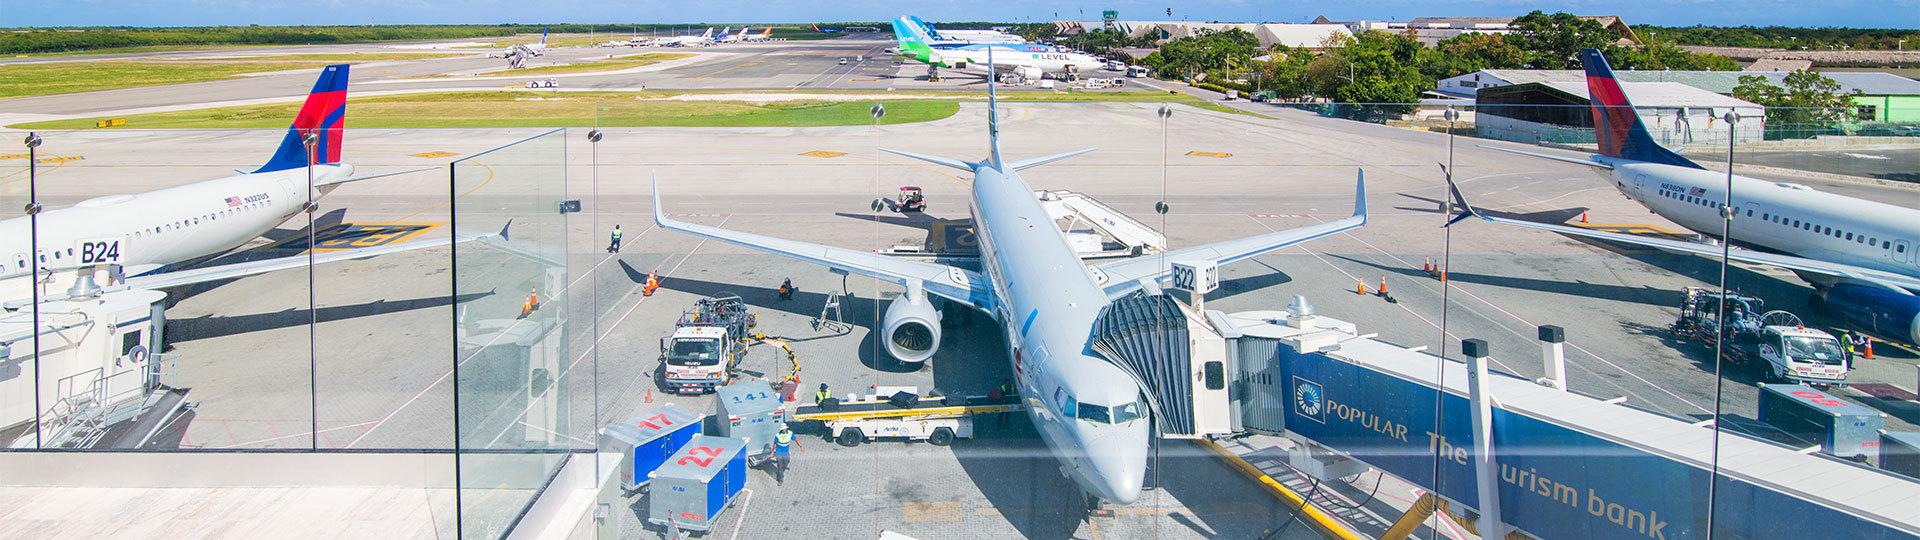 Punta Cana International Airport PUJ